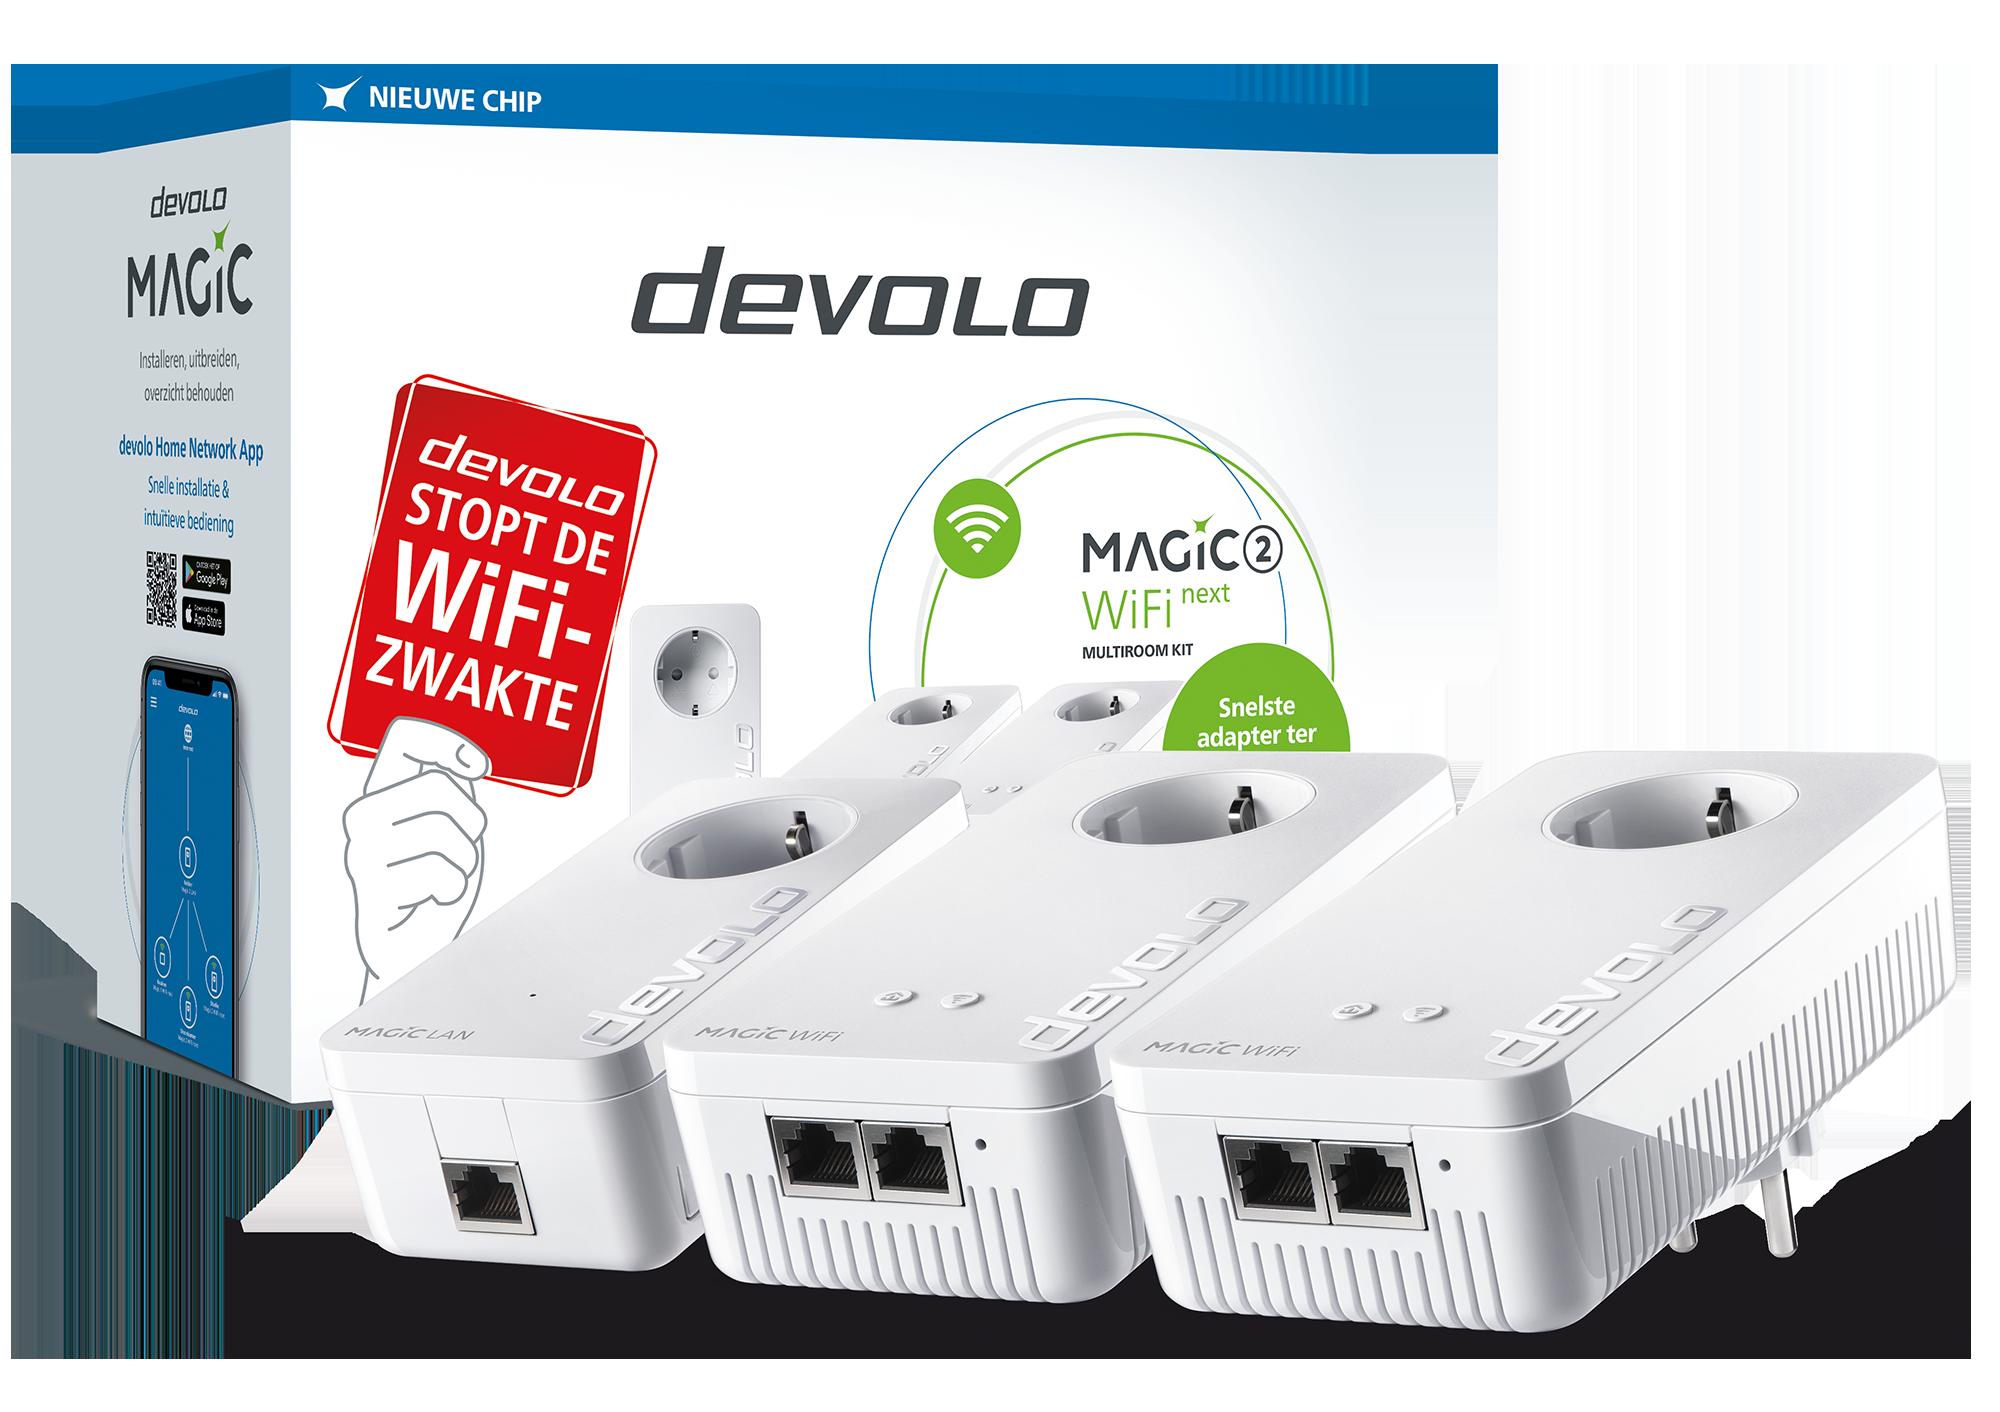 Devolo 8630 Magic 2 WiFi Next Multiroom Kit Powerline